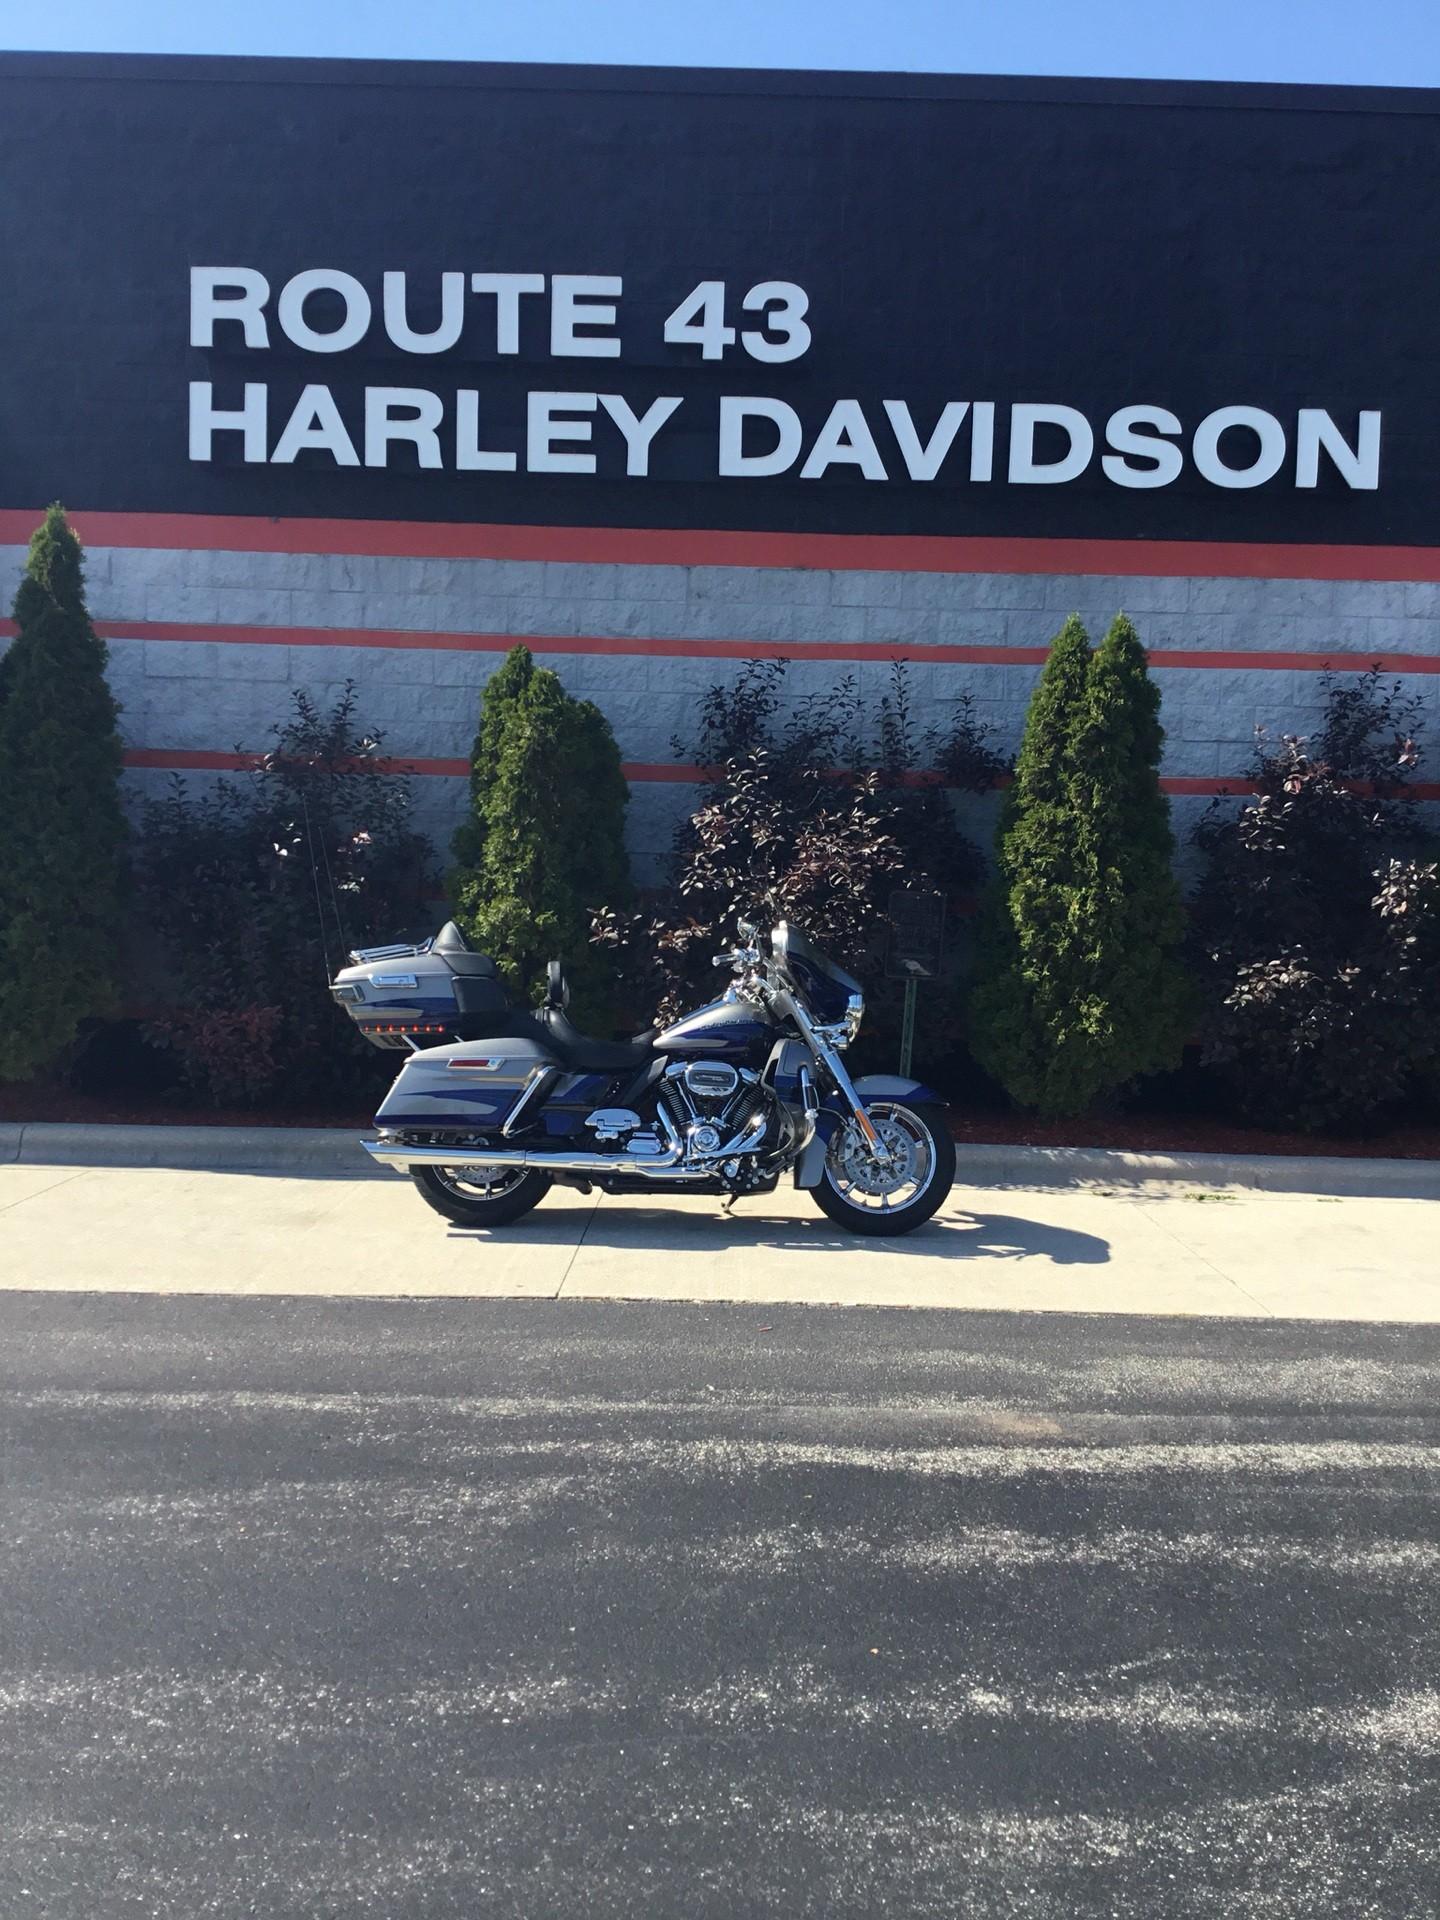 Used 2017 Harley-Davidson CVO™ Limited Motorcycles in Sheboygan, Harley Flhtkse Wiring Schematic on